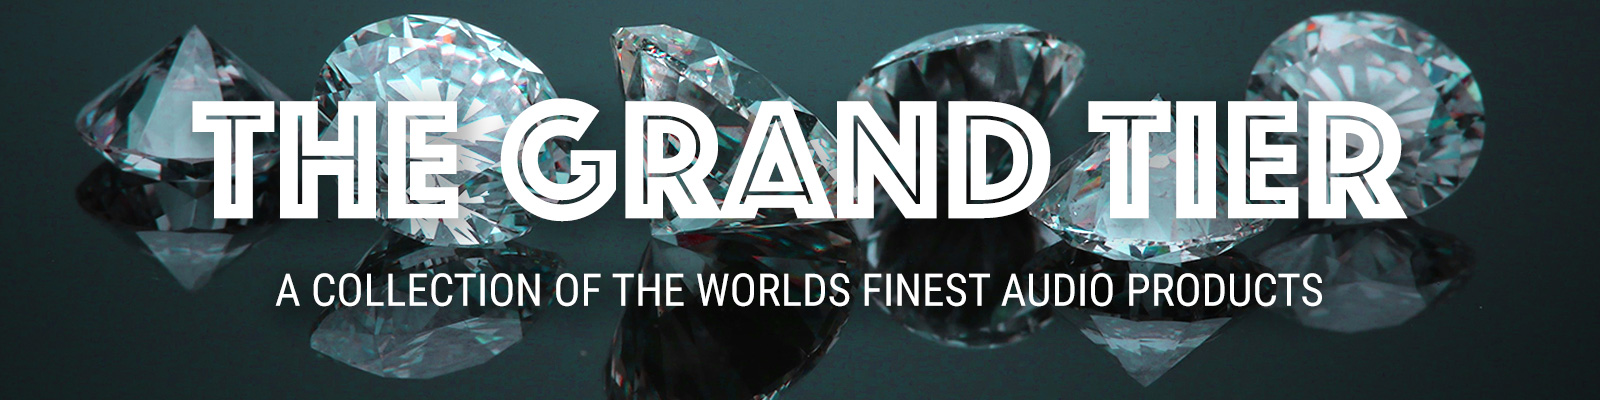 The Grand Tier | Audio Sanctuary